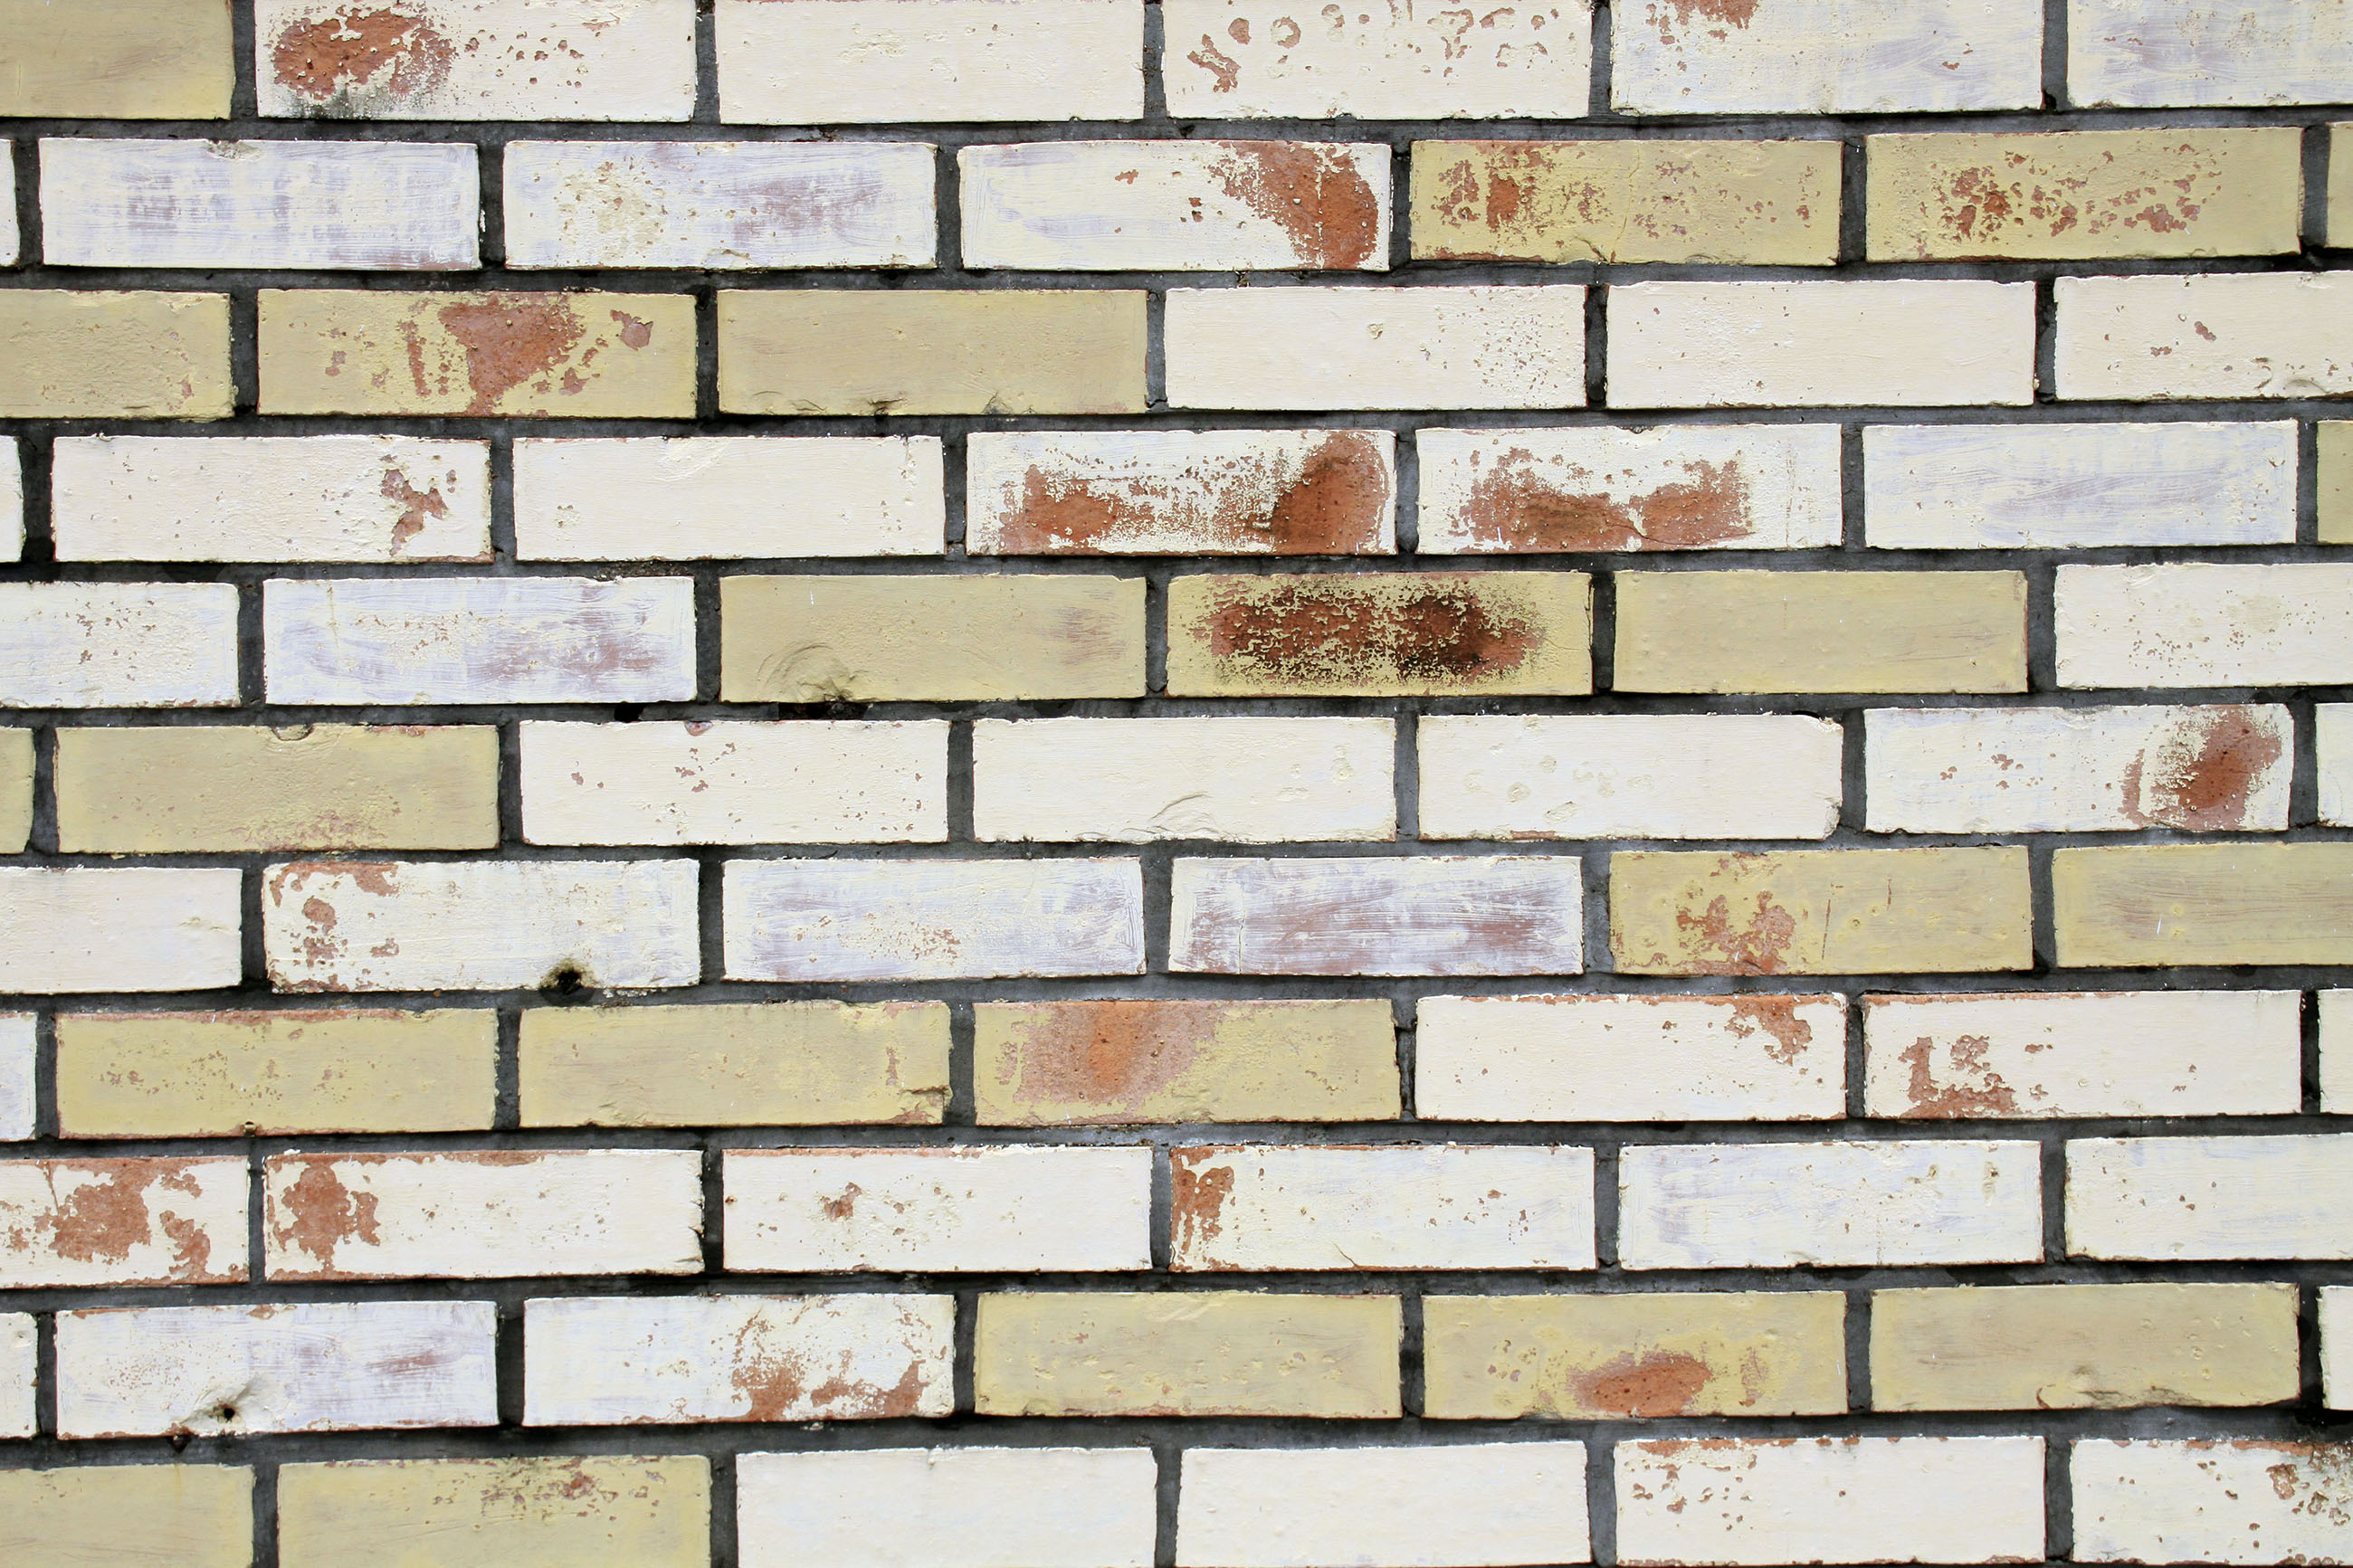 Worn Brick Wall, Aged, Architecture, Worn, Wall, HQ Photo